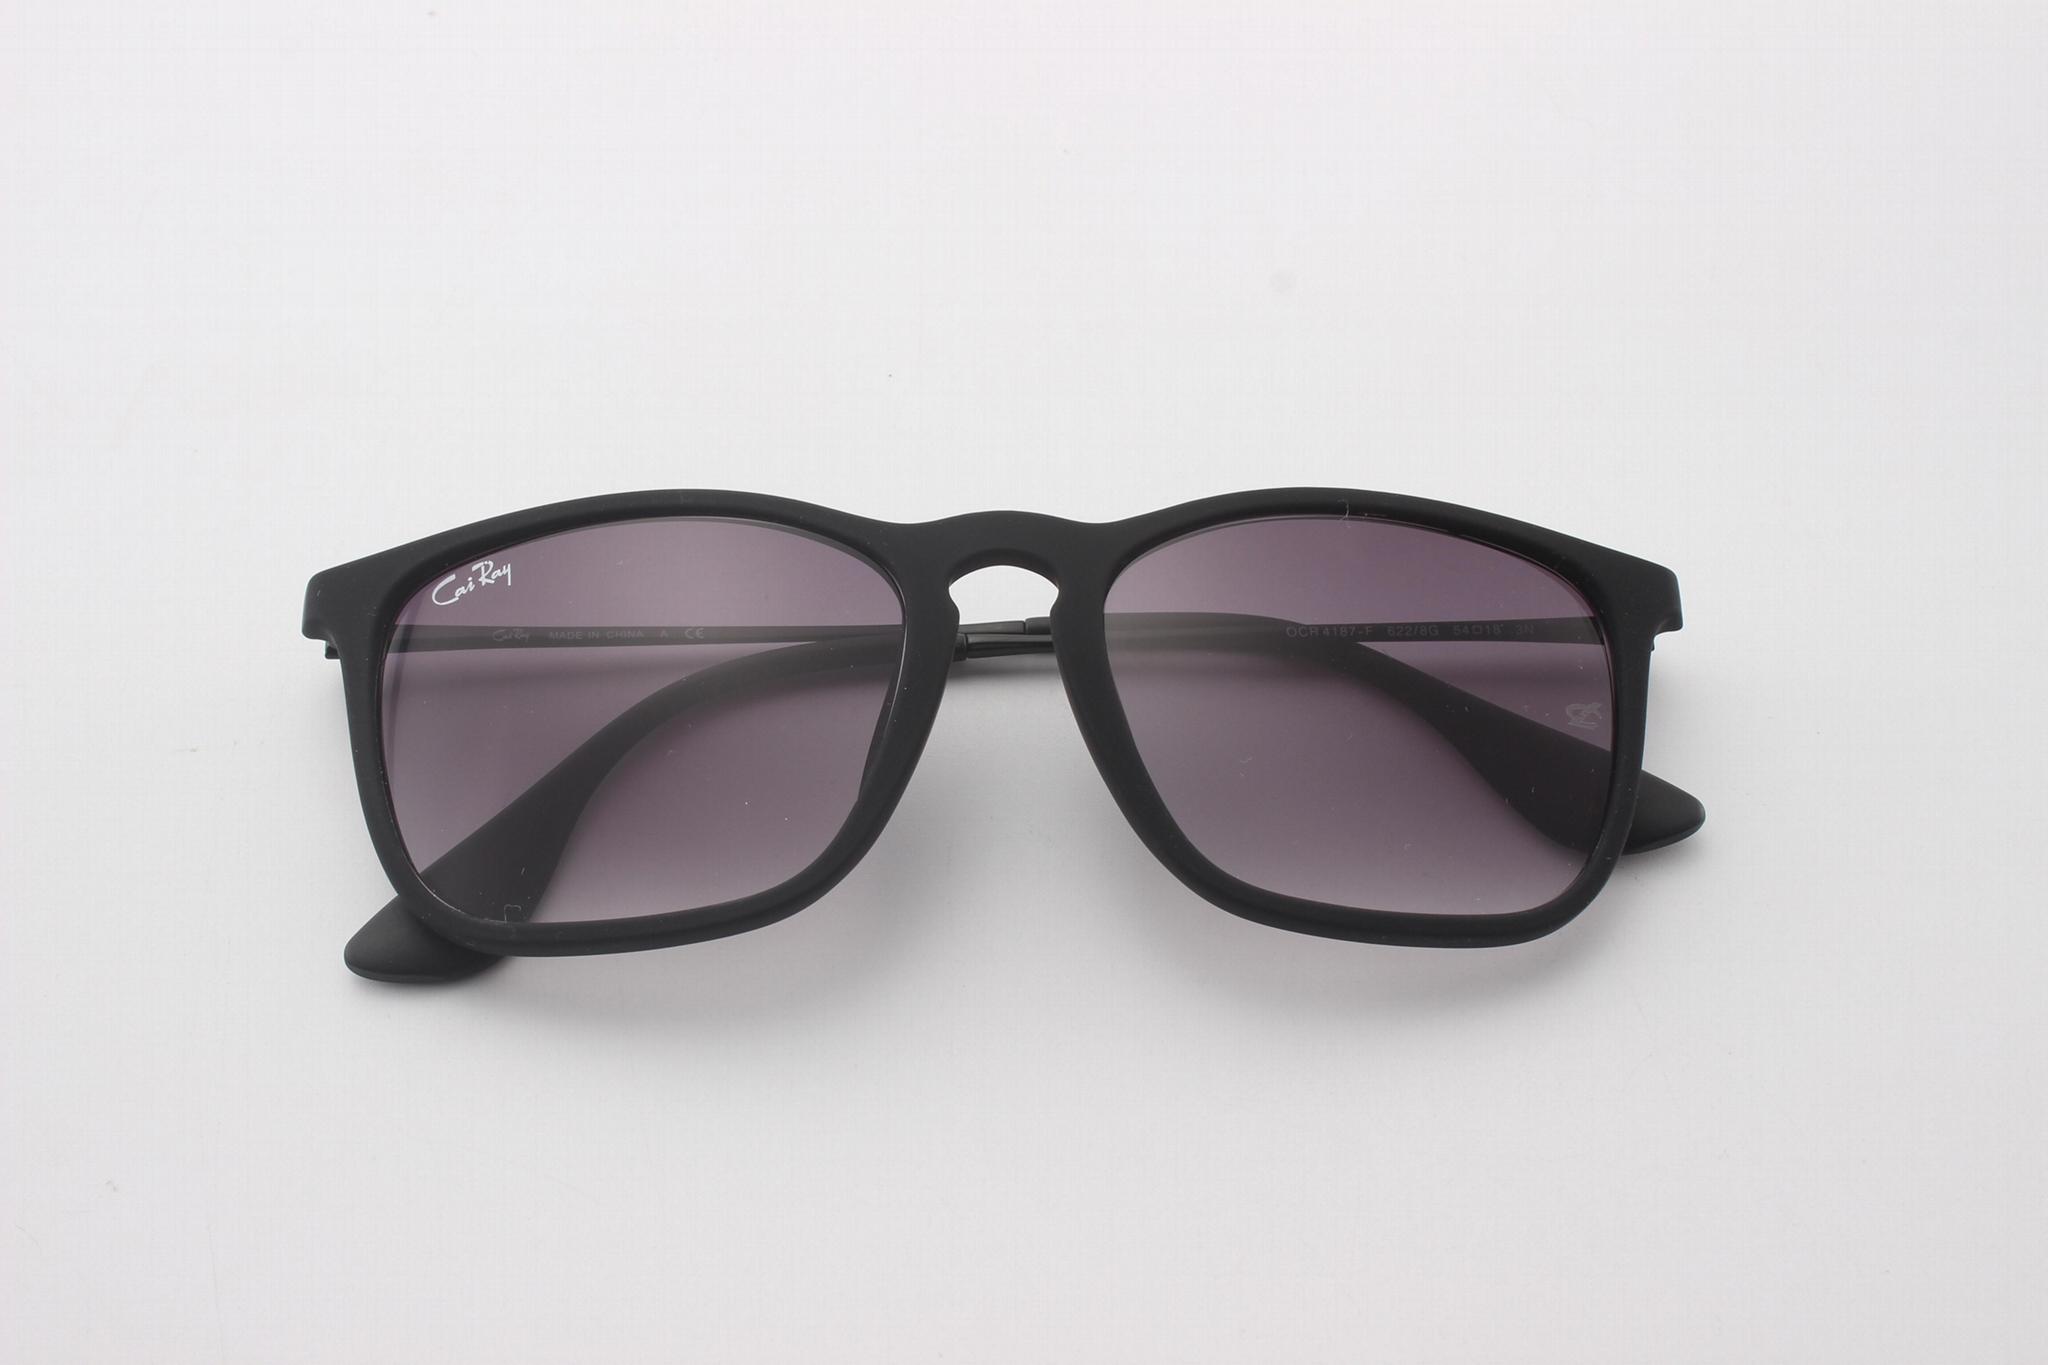 Cai Ray original Chris sunglasses CR4187 622/8G black/gradient gray lens 54mm